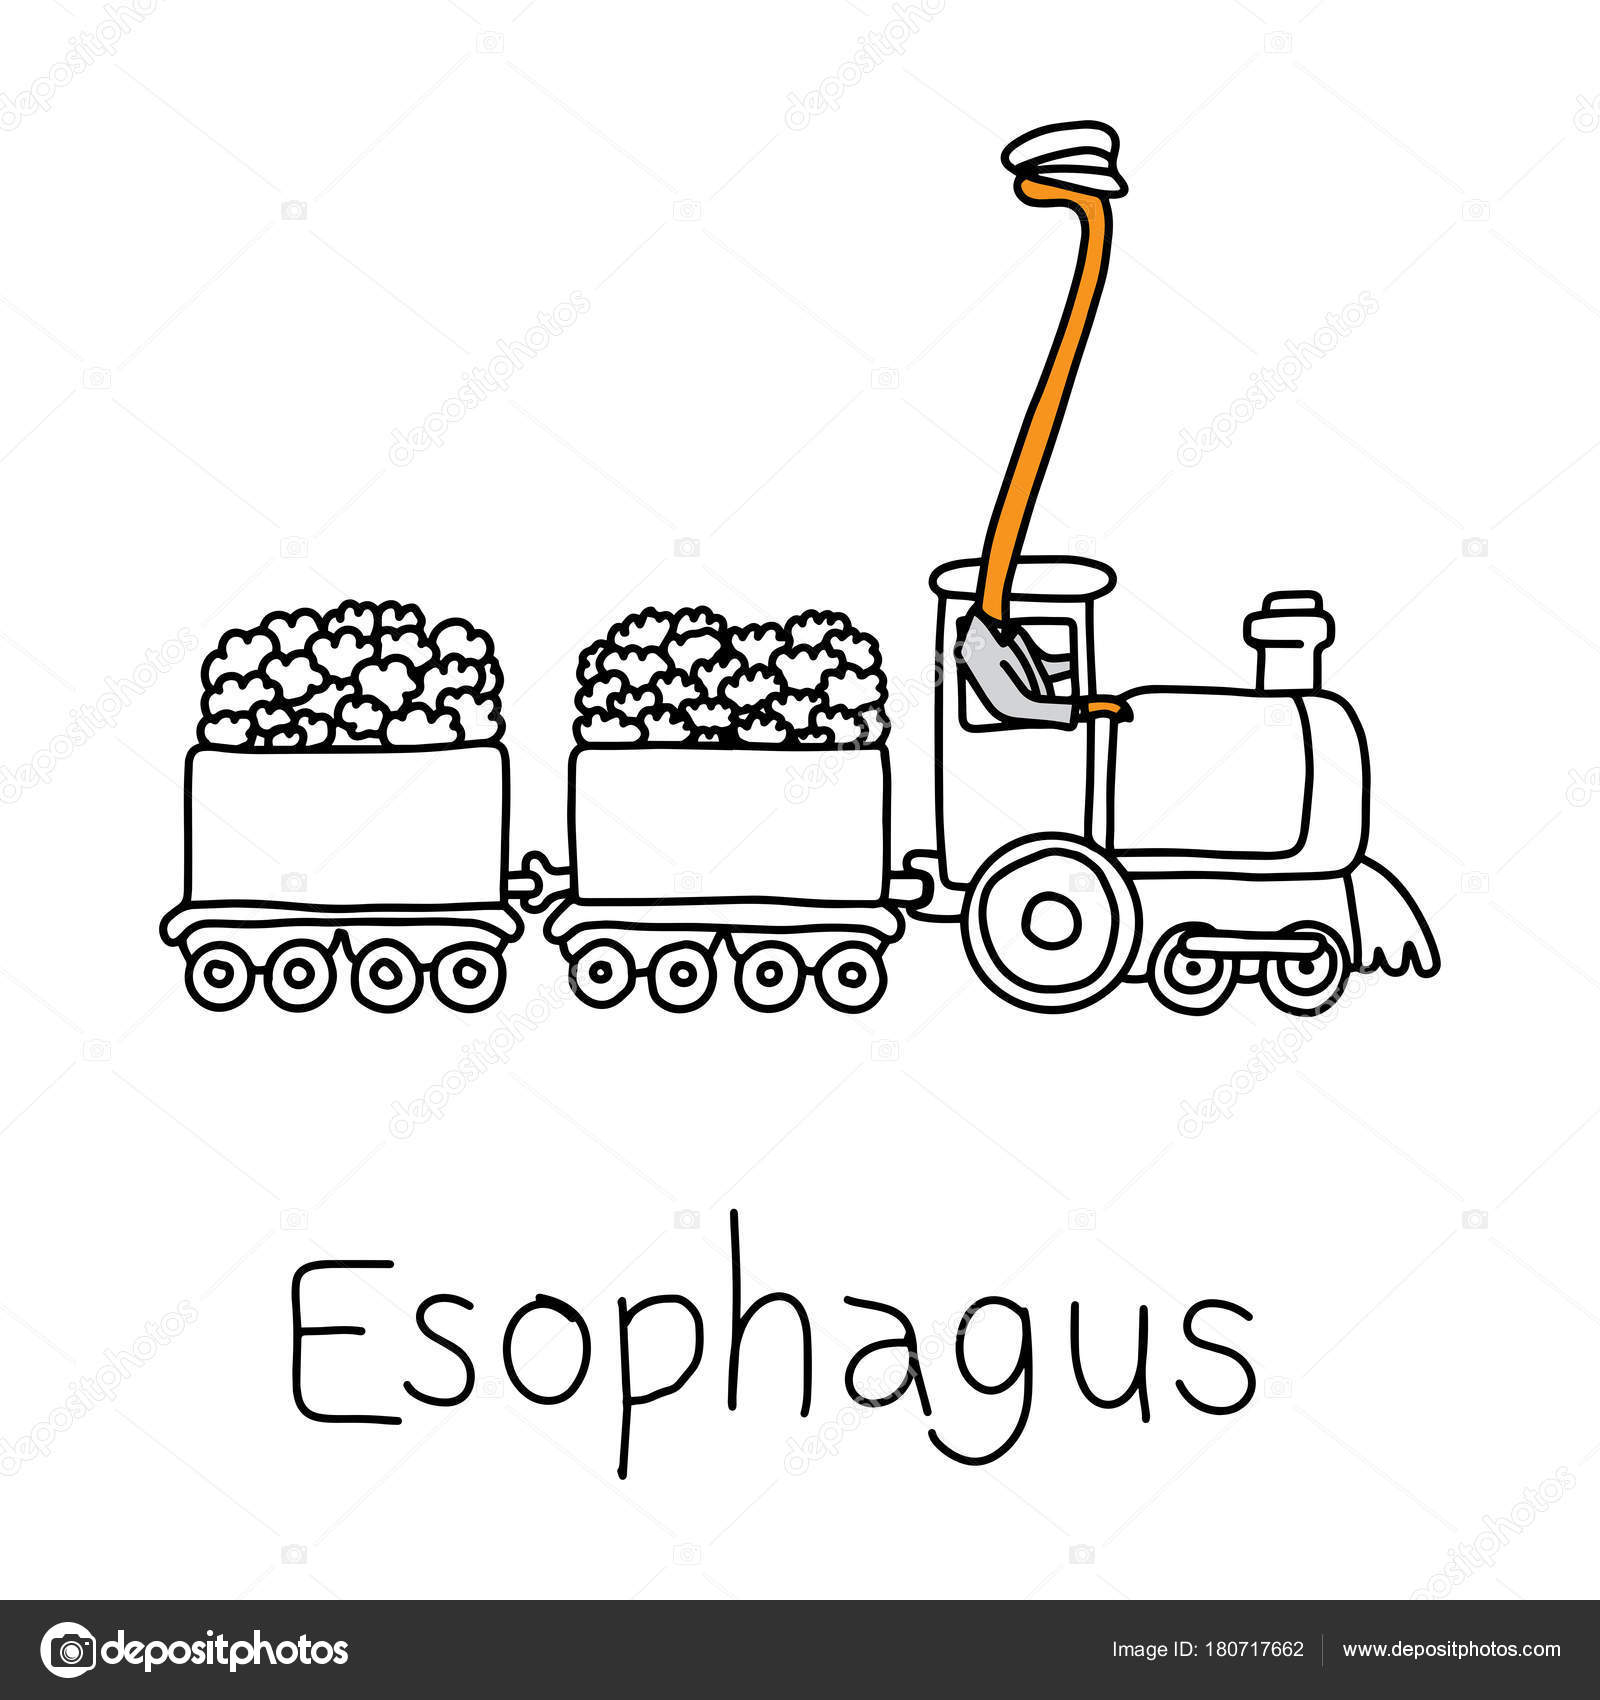 Cartoon Esophagus Pictures